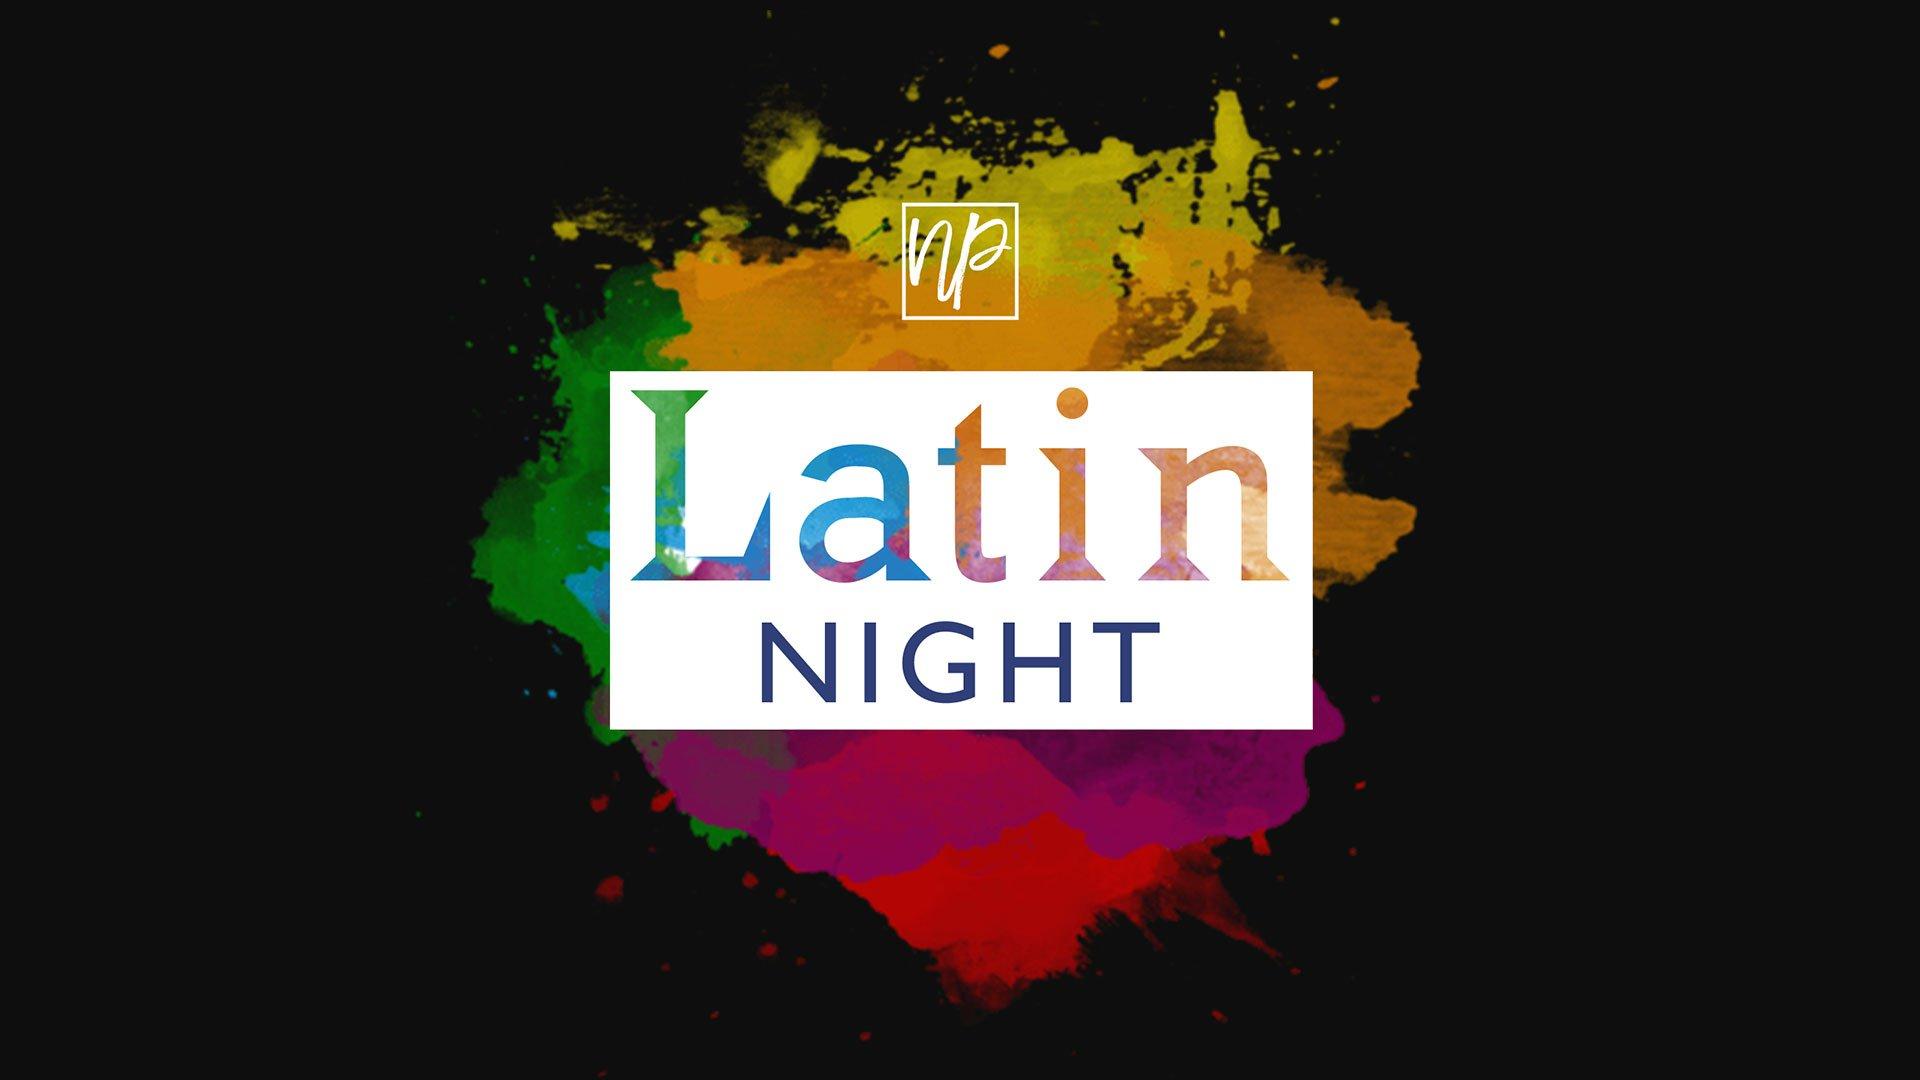 North Palm Latin Night